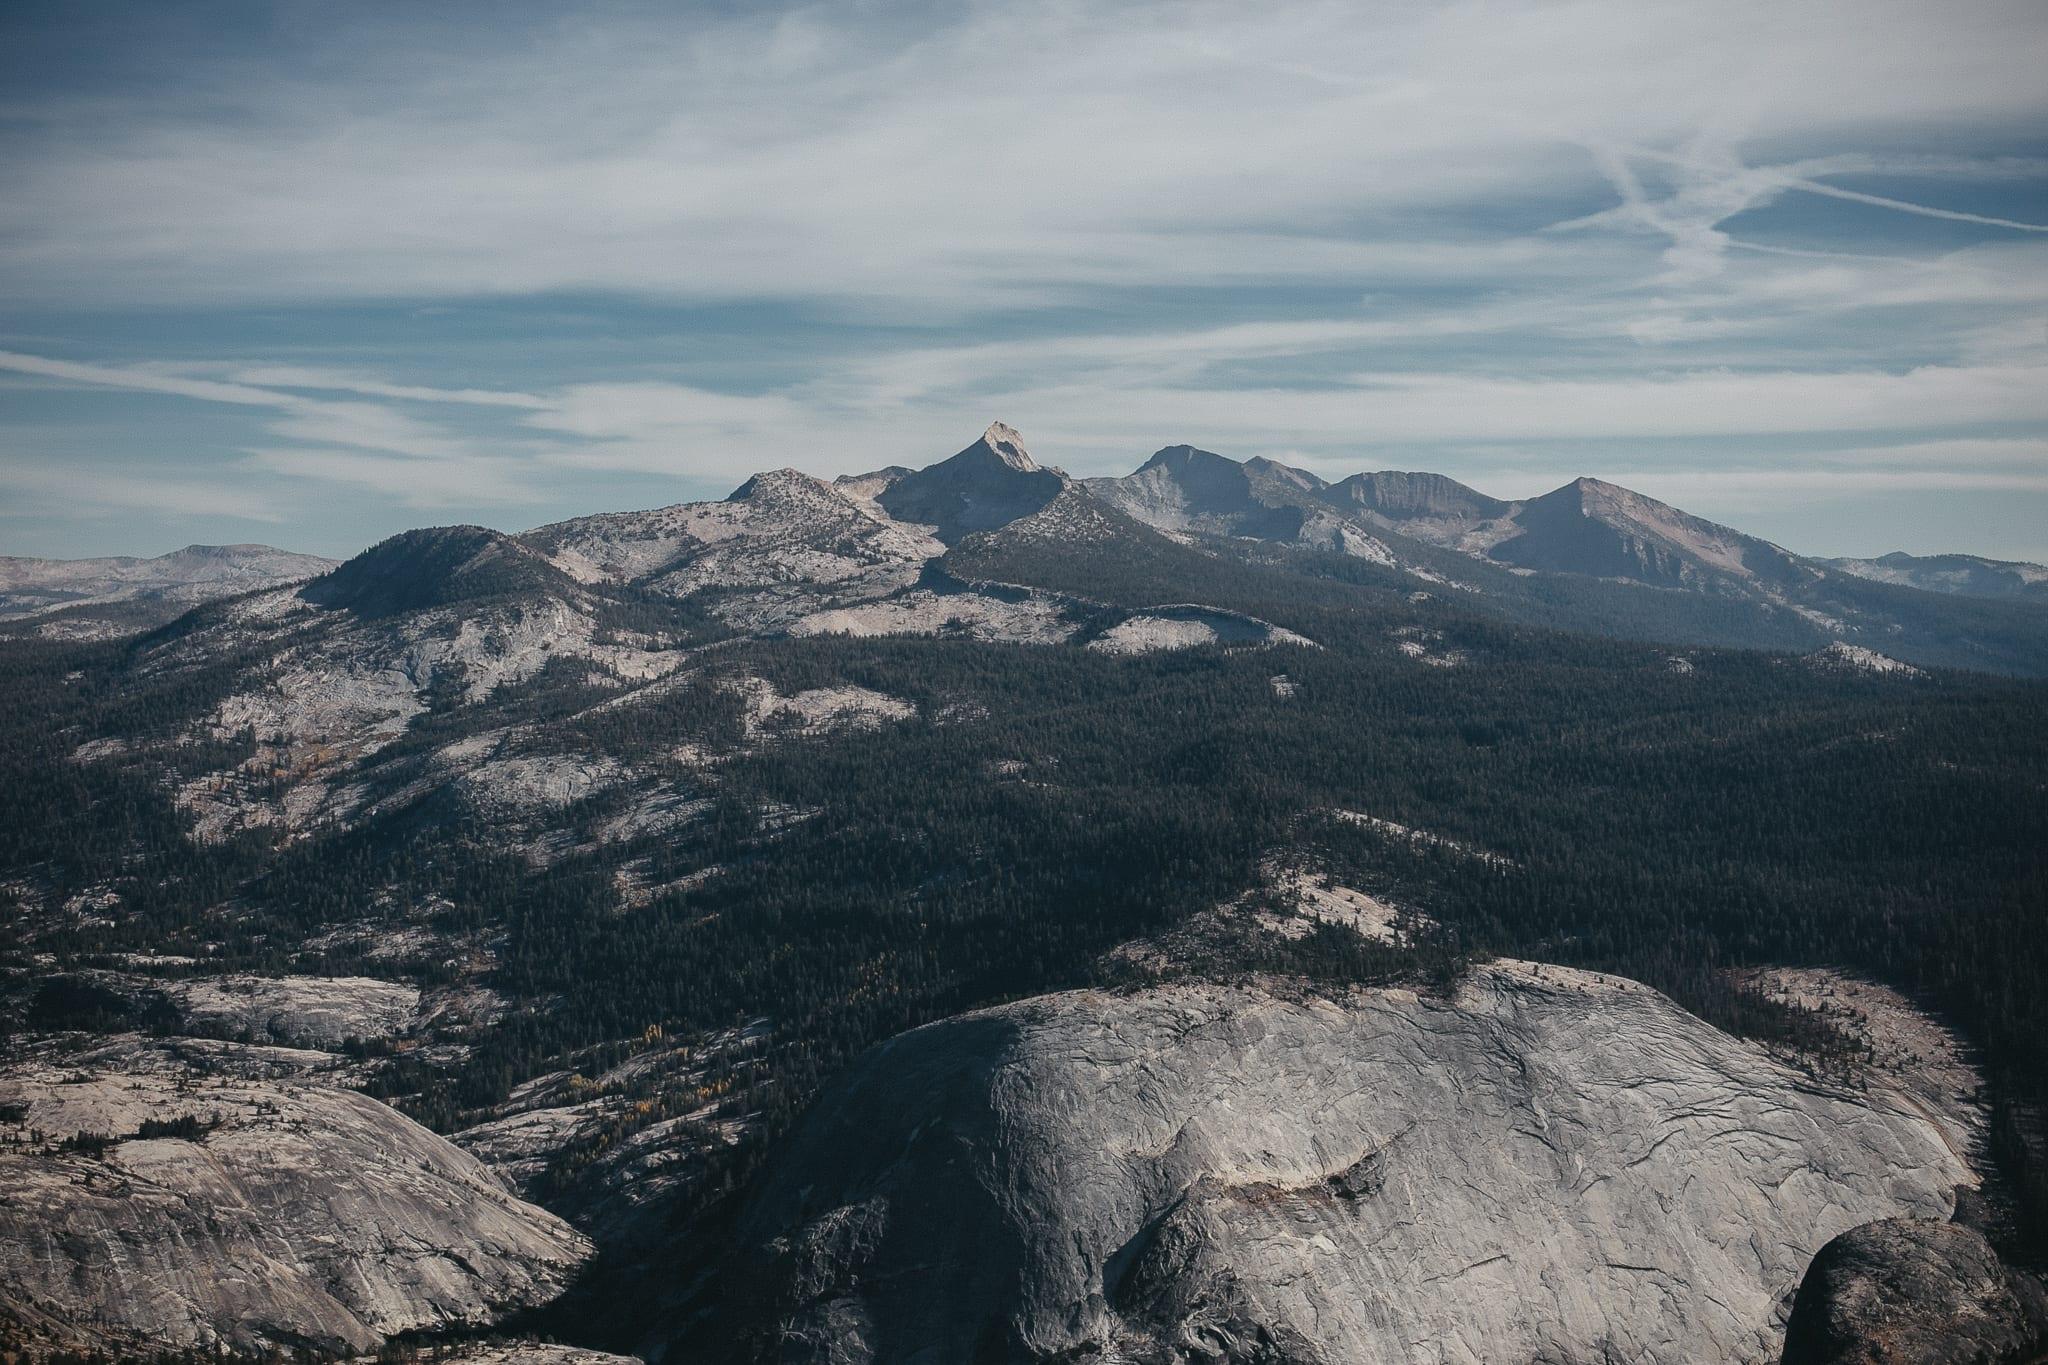 clouds-rest-yosemite-california-engagement-lifestyle-adventure-photographer-11